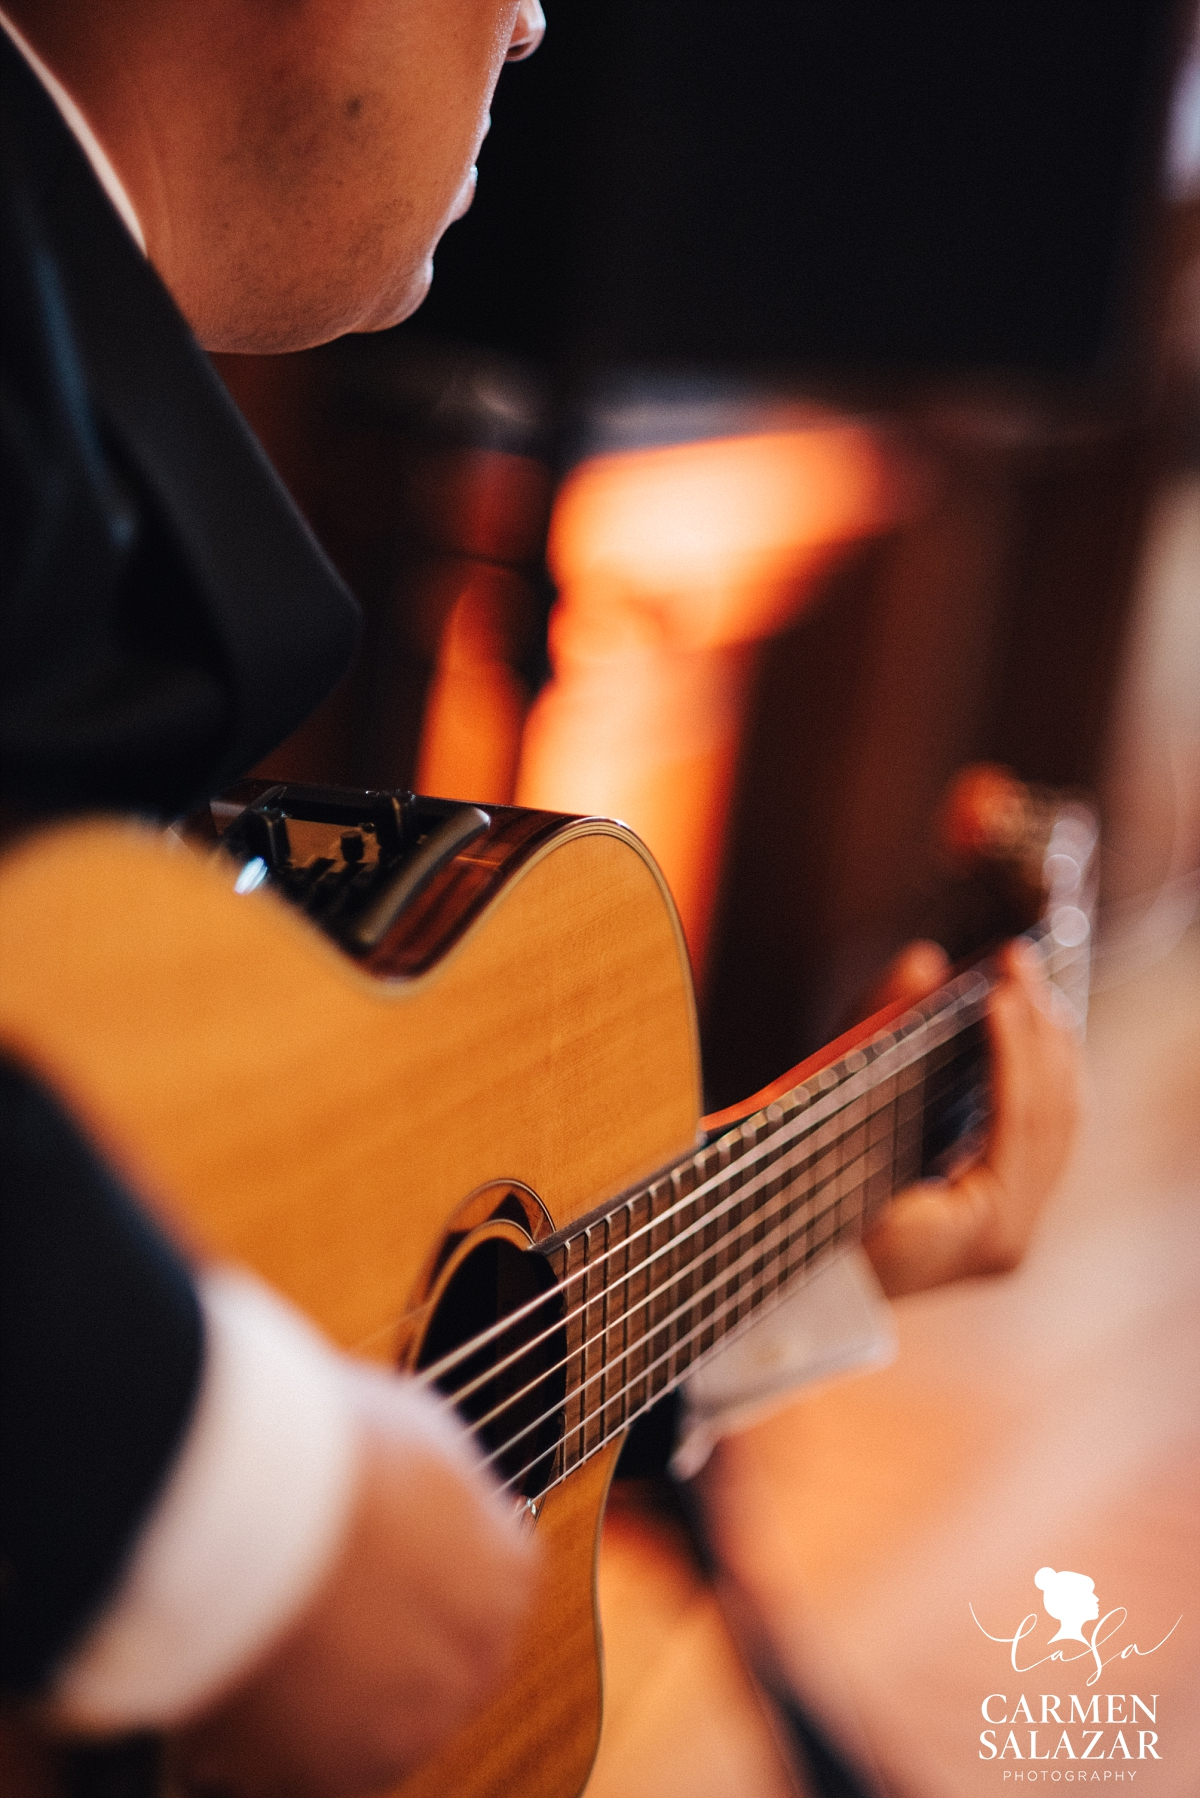 Acoustic guitarist at Crocker Art Museum reception - Carmen Salazar